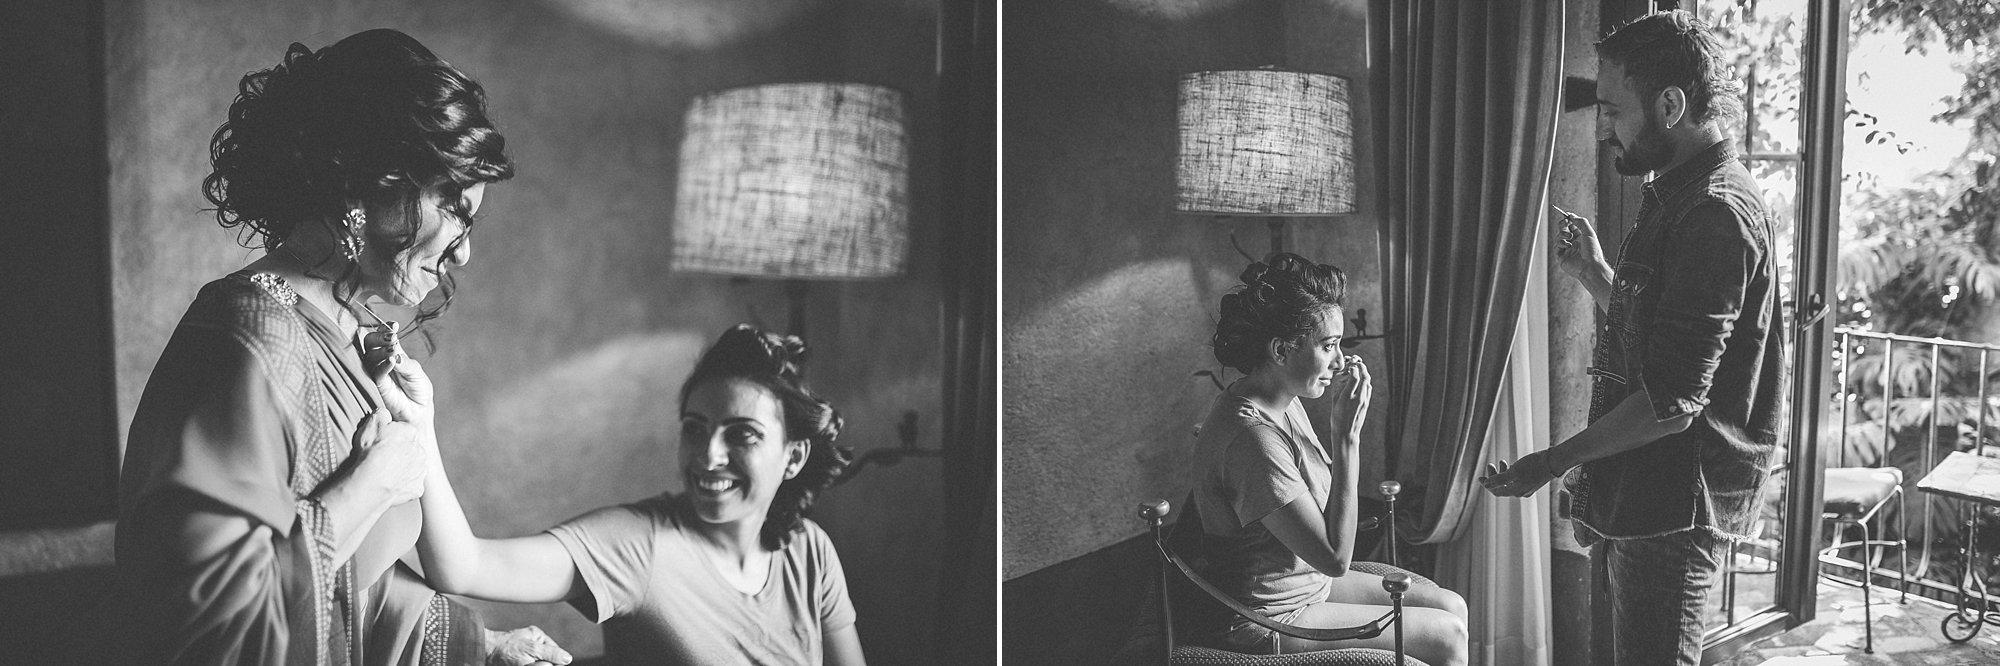 alex-yazmin-wedding-photographer-antigua-guatemala-043